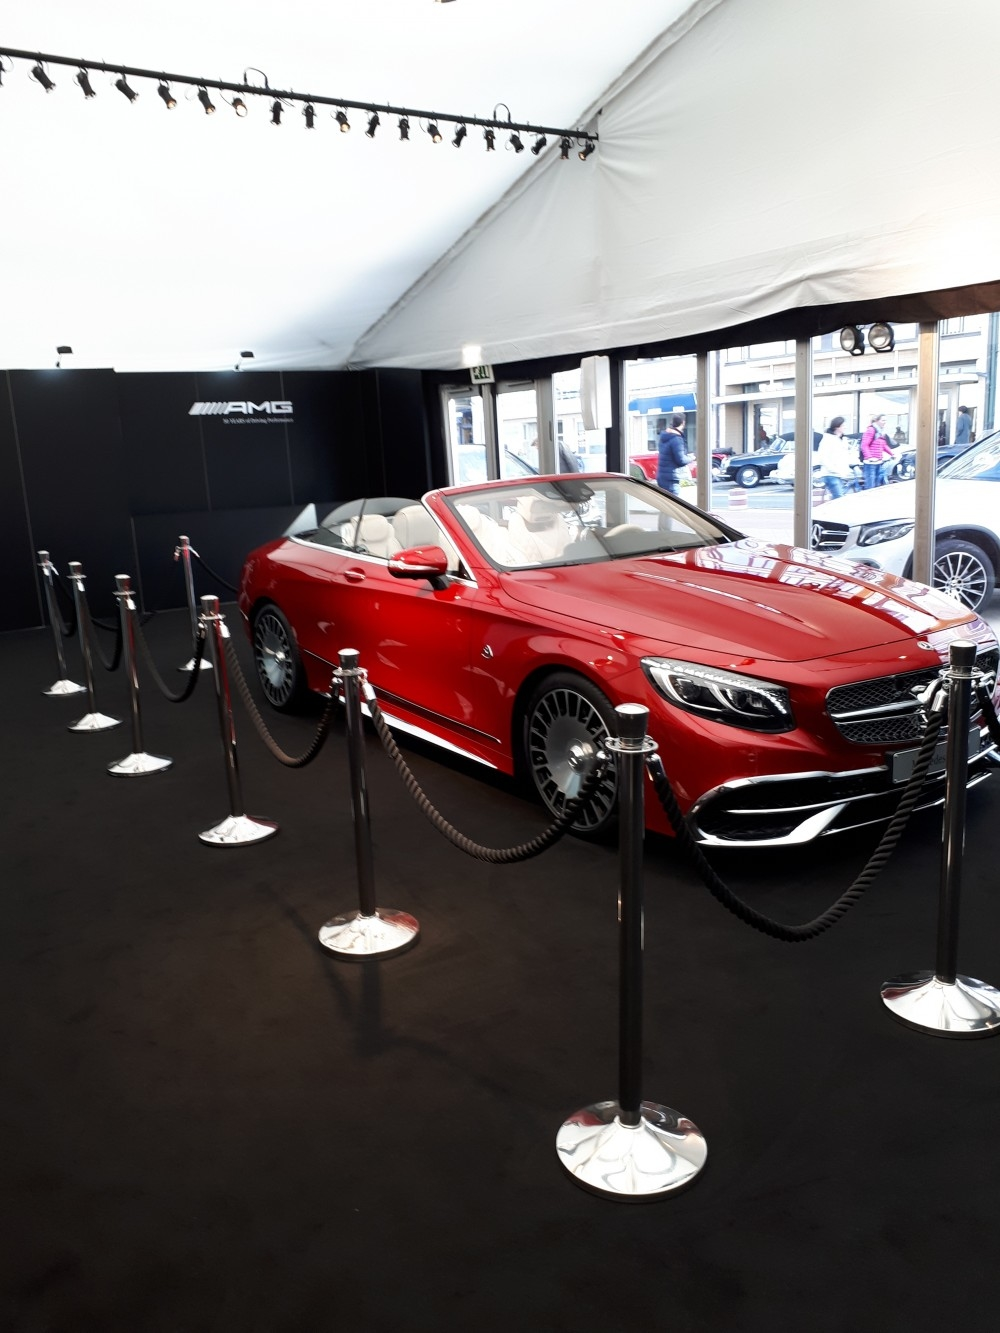 zoute grand prix-conceptexpo-mercedes AMG- pop up store- construction stand - aménagement de stand (6)